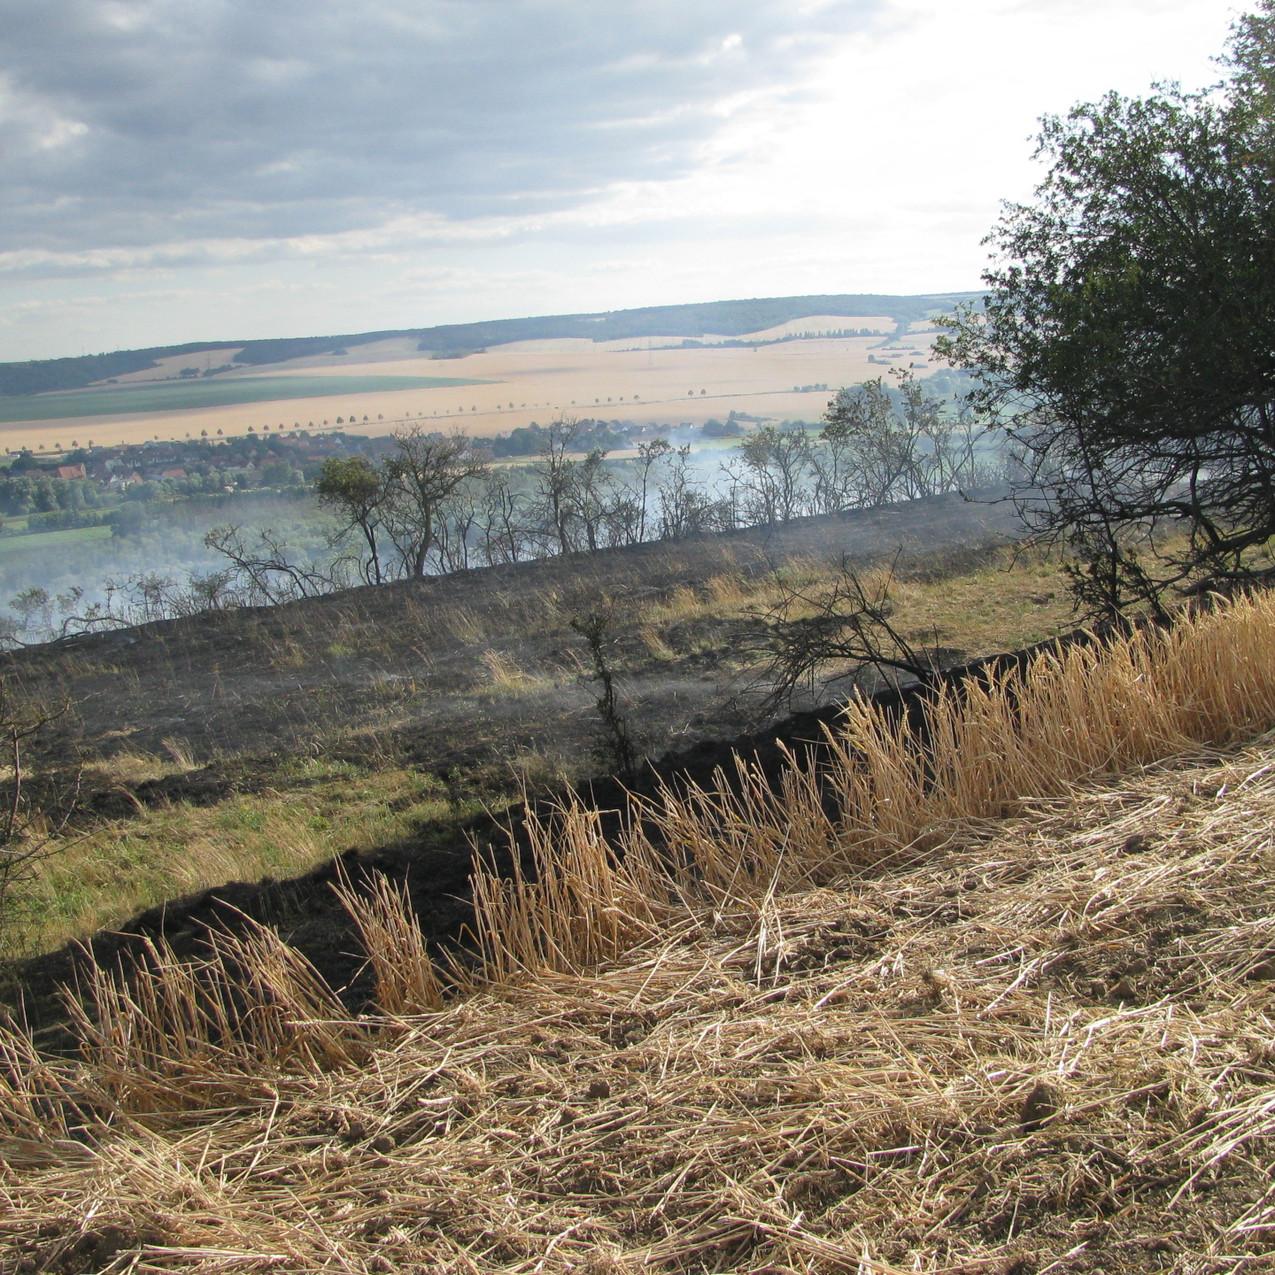 Getreidefeld- und Ödlandbrand